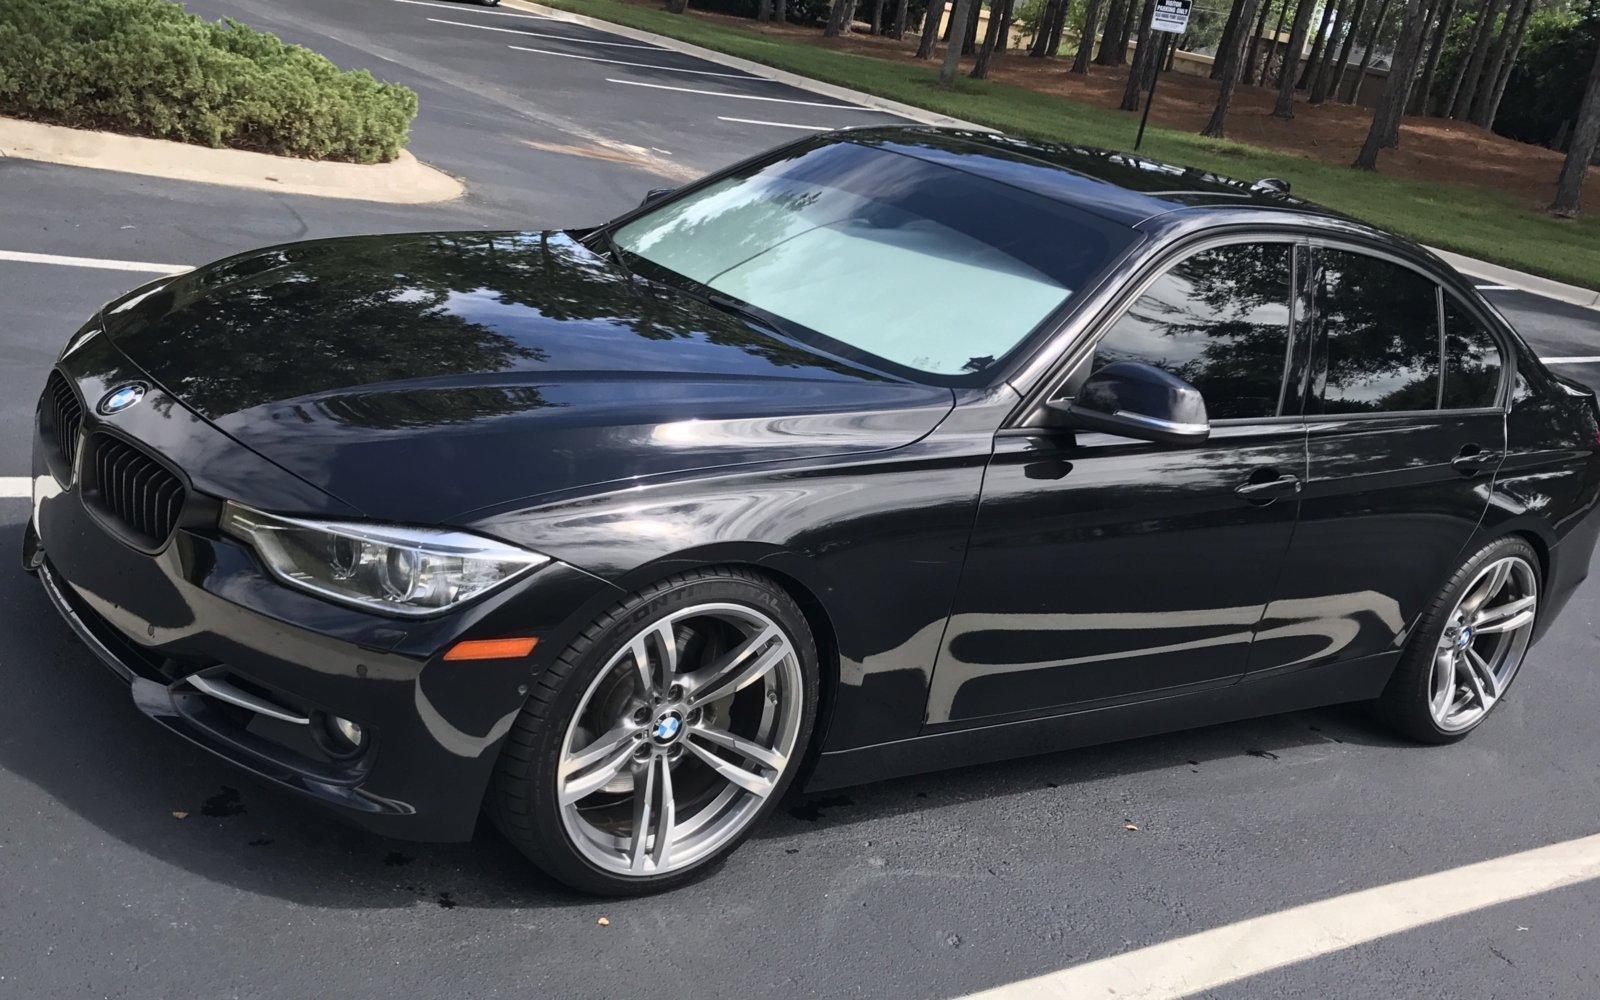 N55 mileage alert | BMW - SpoolStreet